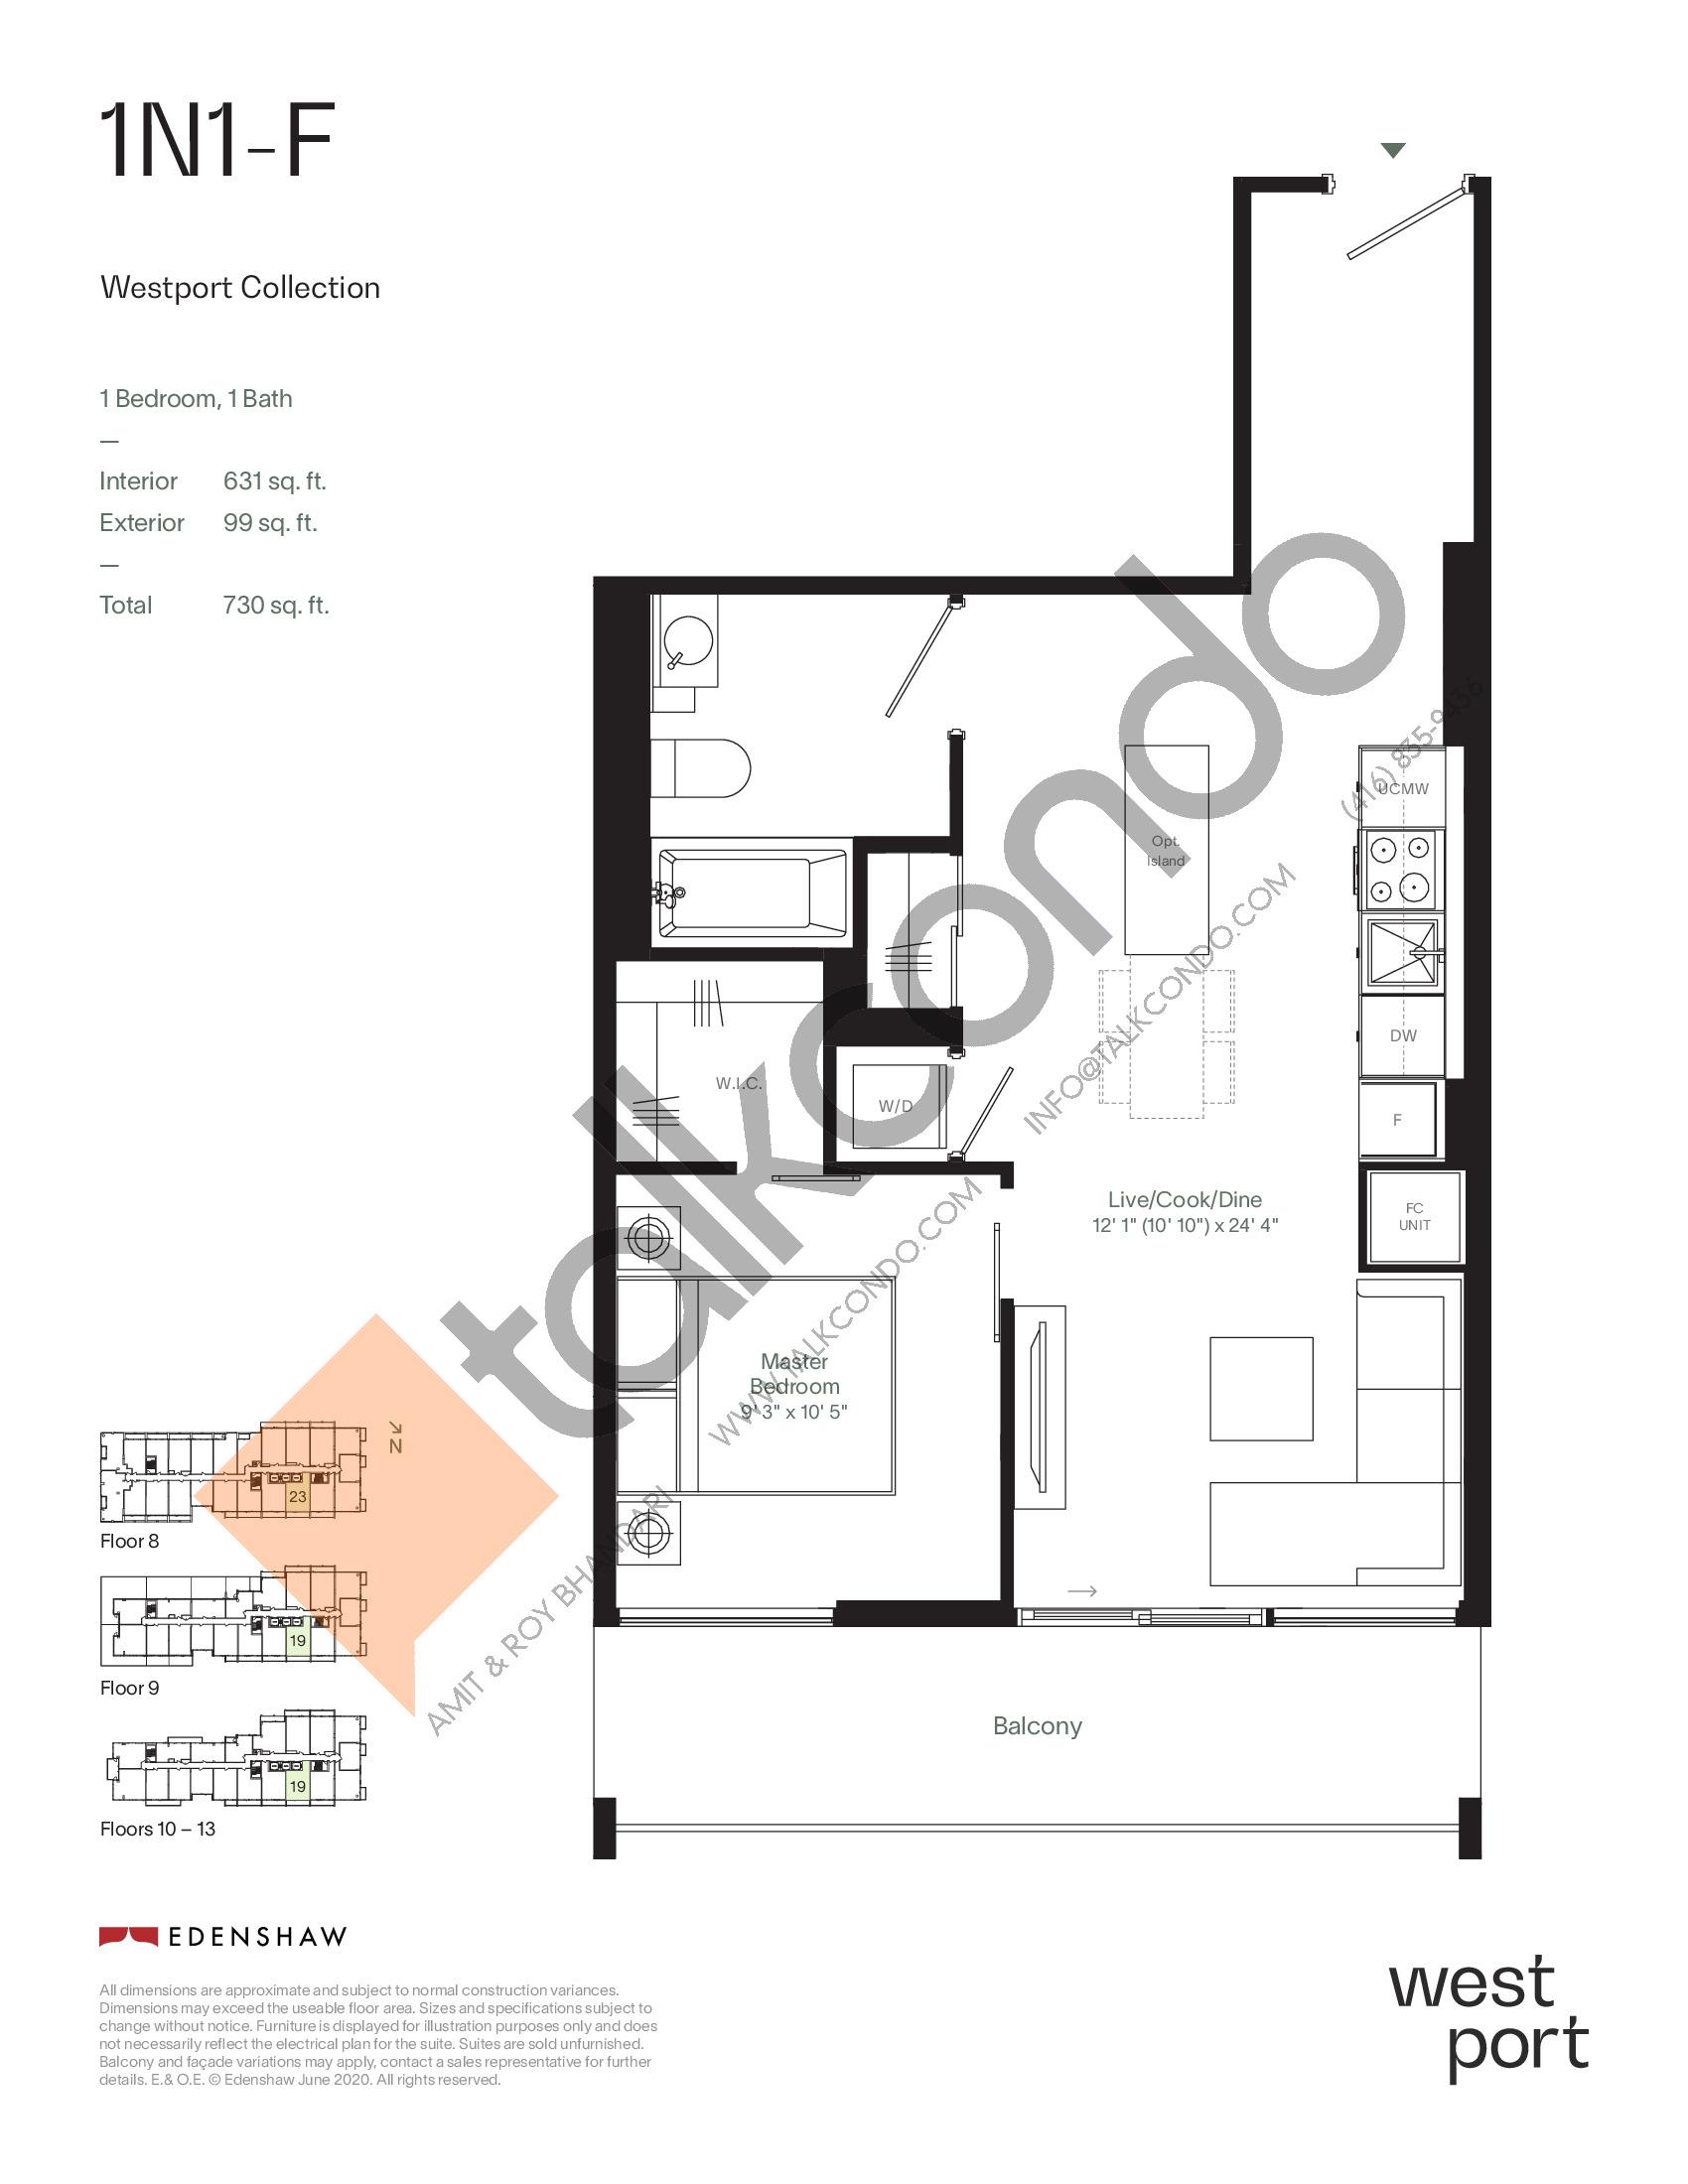 1N1-F - Westport Collection Floor Plan at Westport Condos - 631 sq.ft